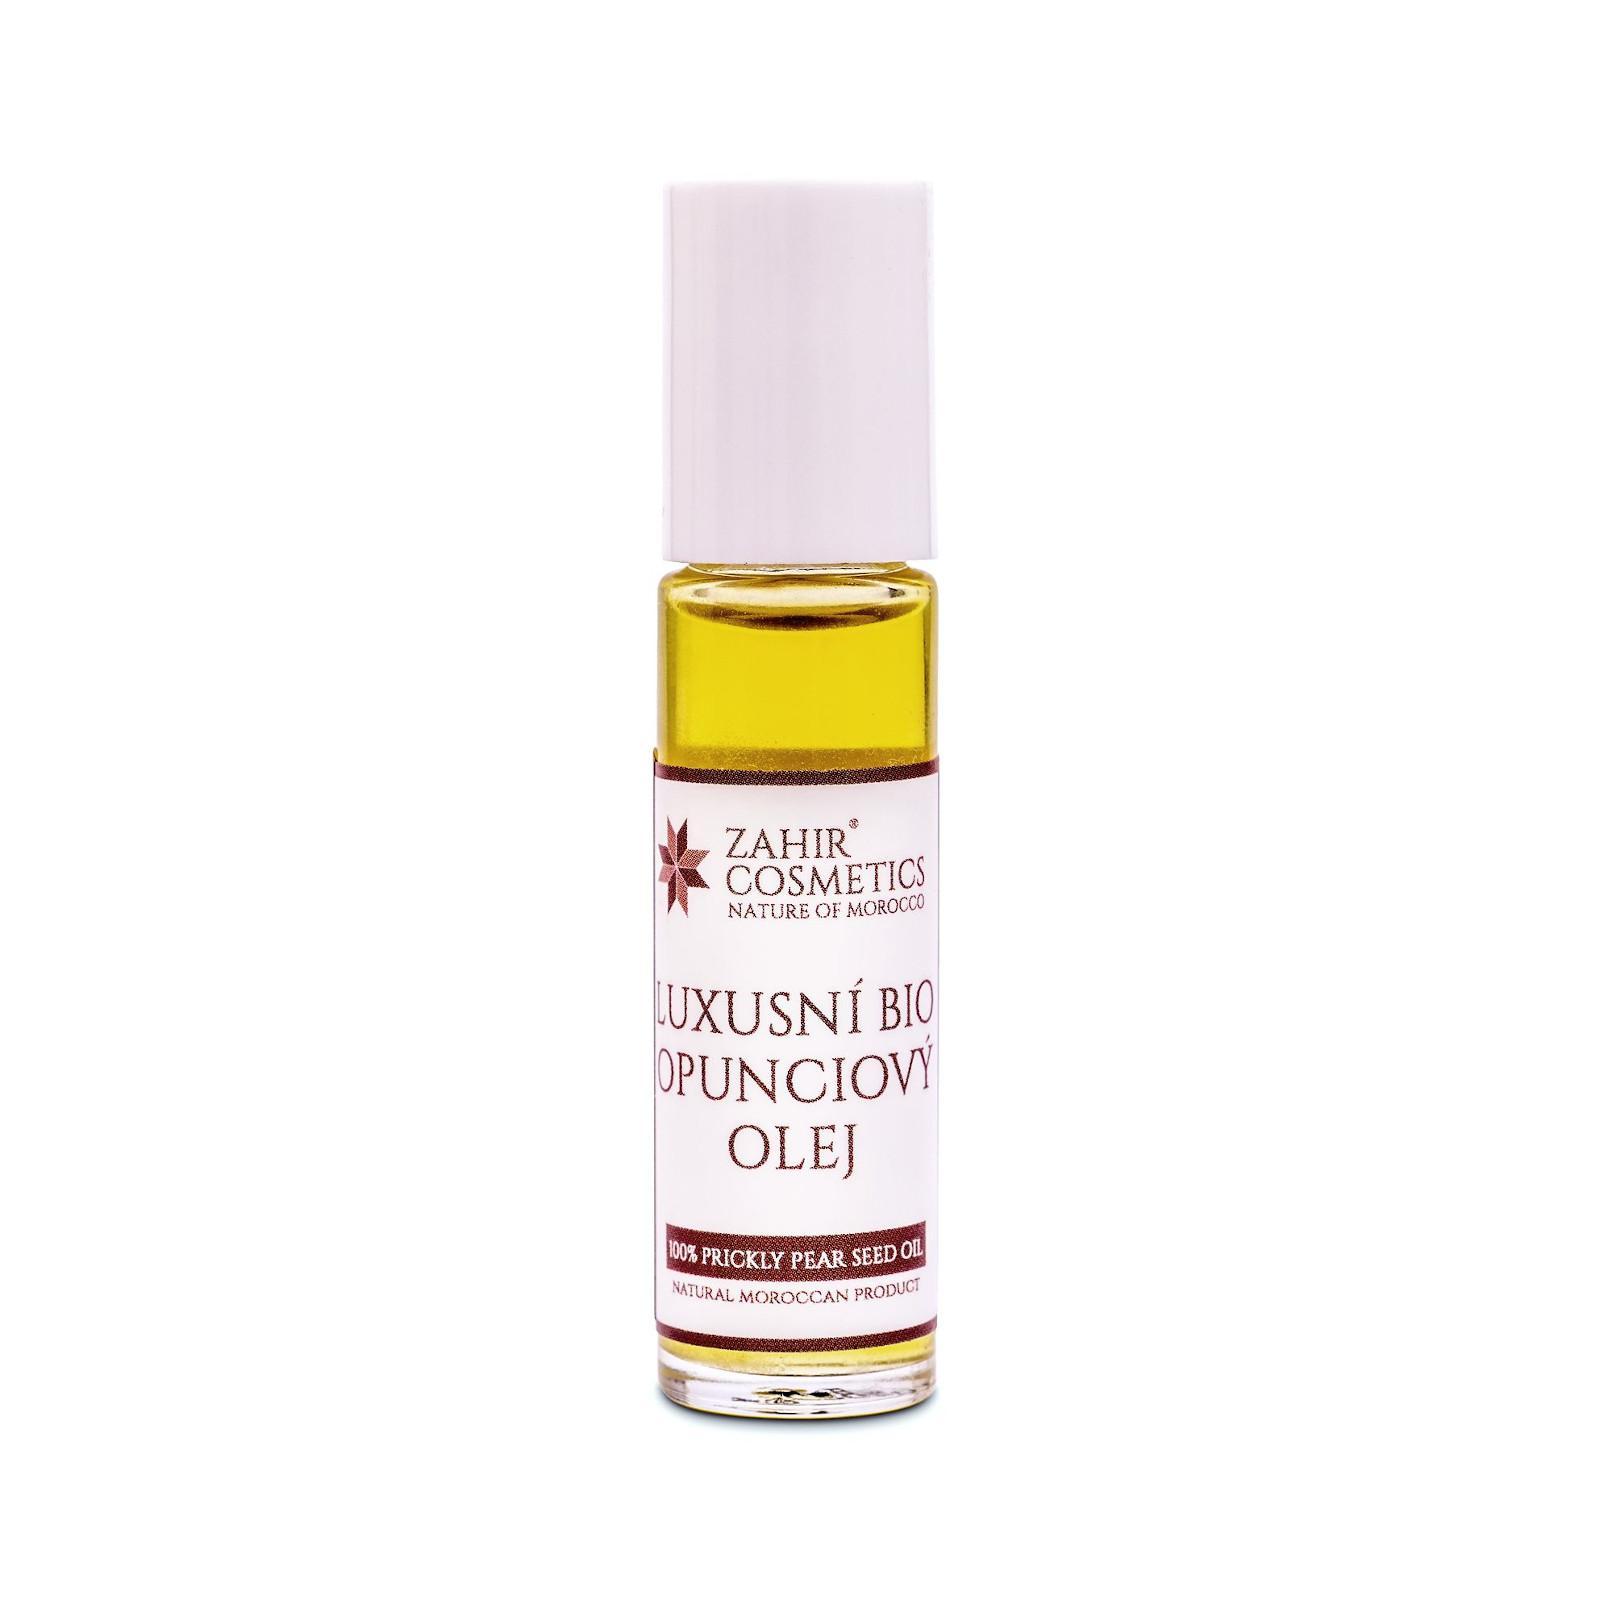 Zahir Cosmetics Opunciový olej 10 ml, roll-on